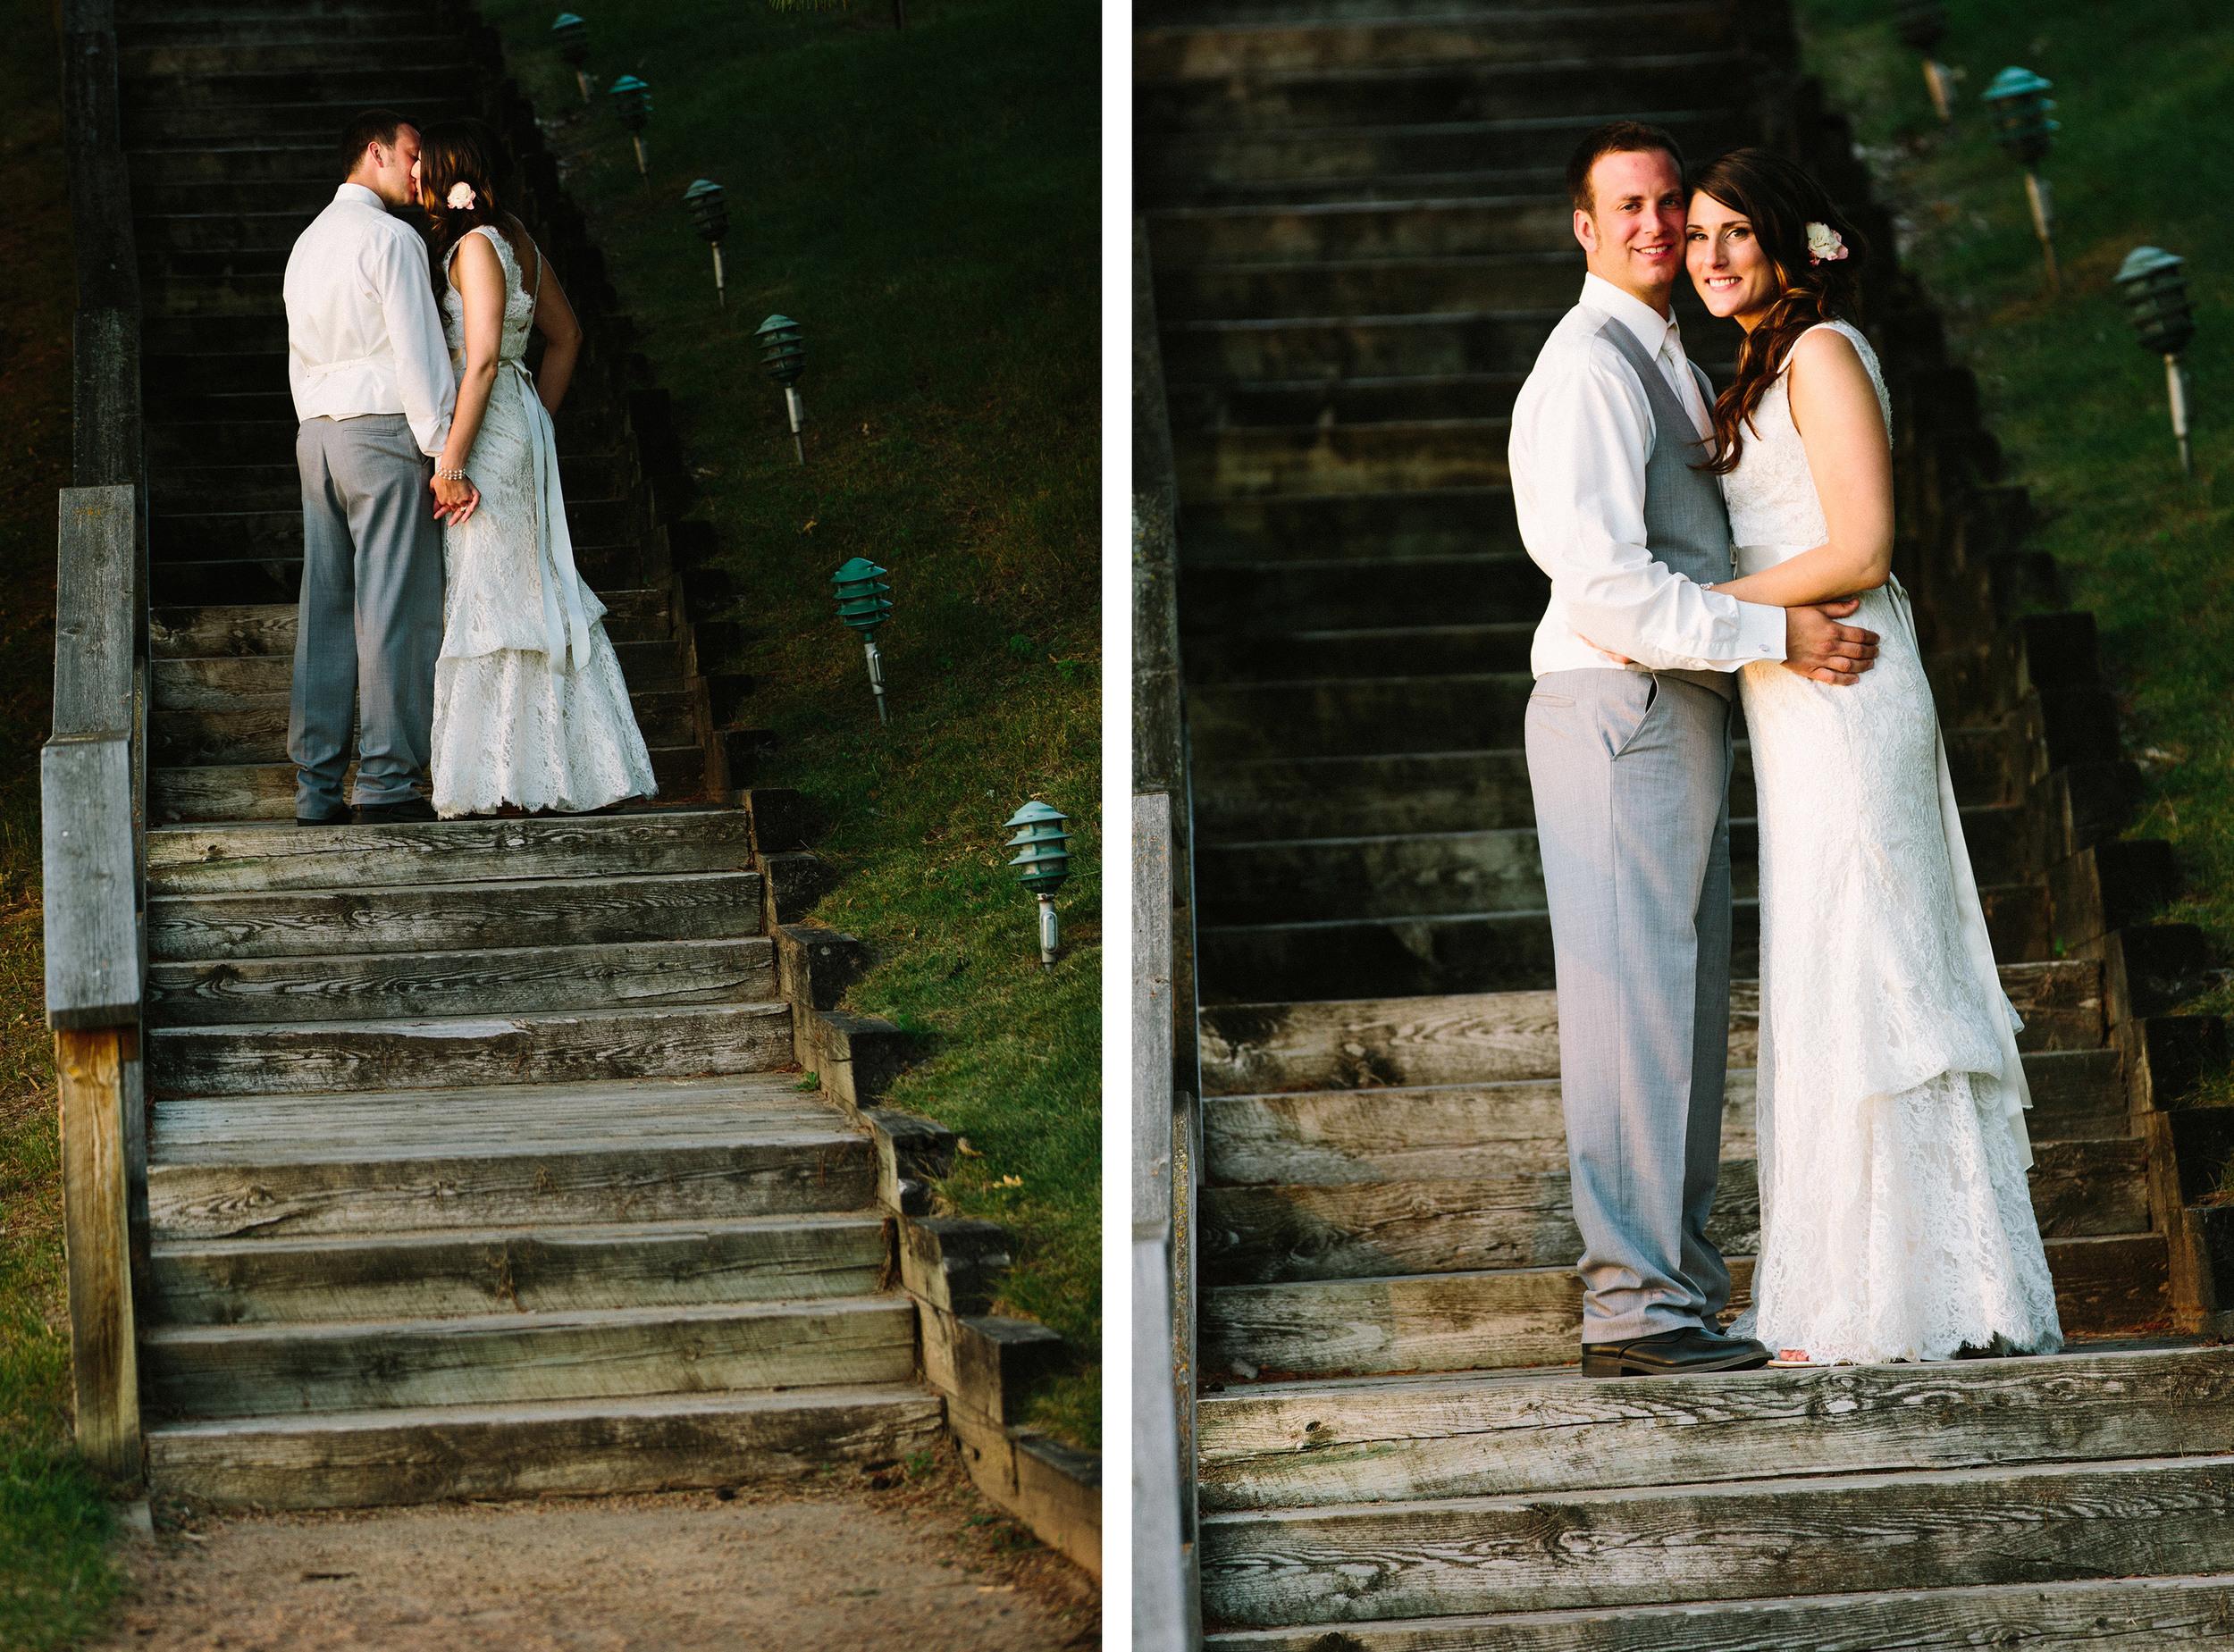 50-Maddens_Resort_Wedding_Wilson_Bay_Gull_Lake.jpg